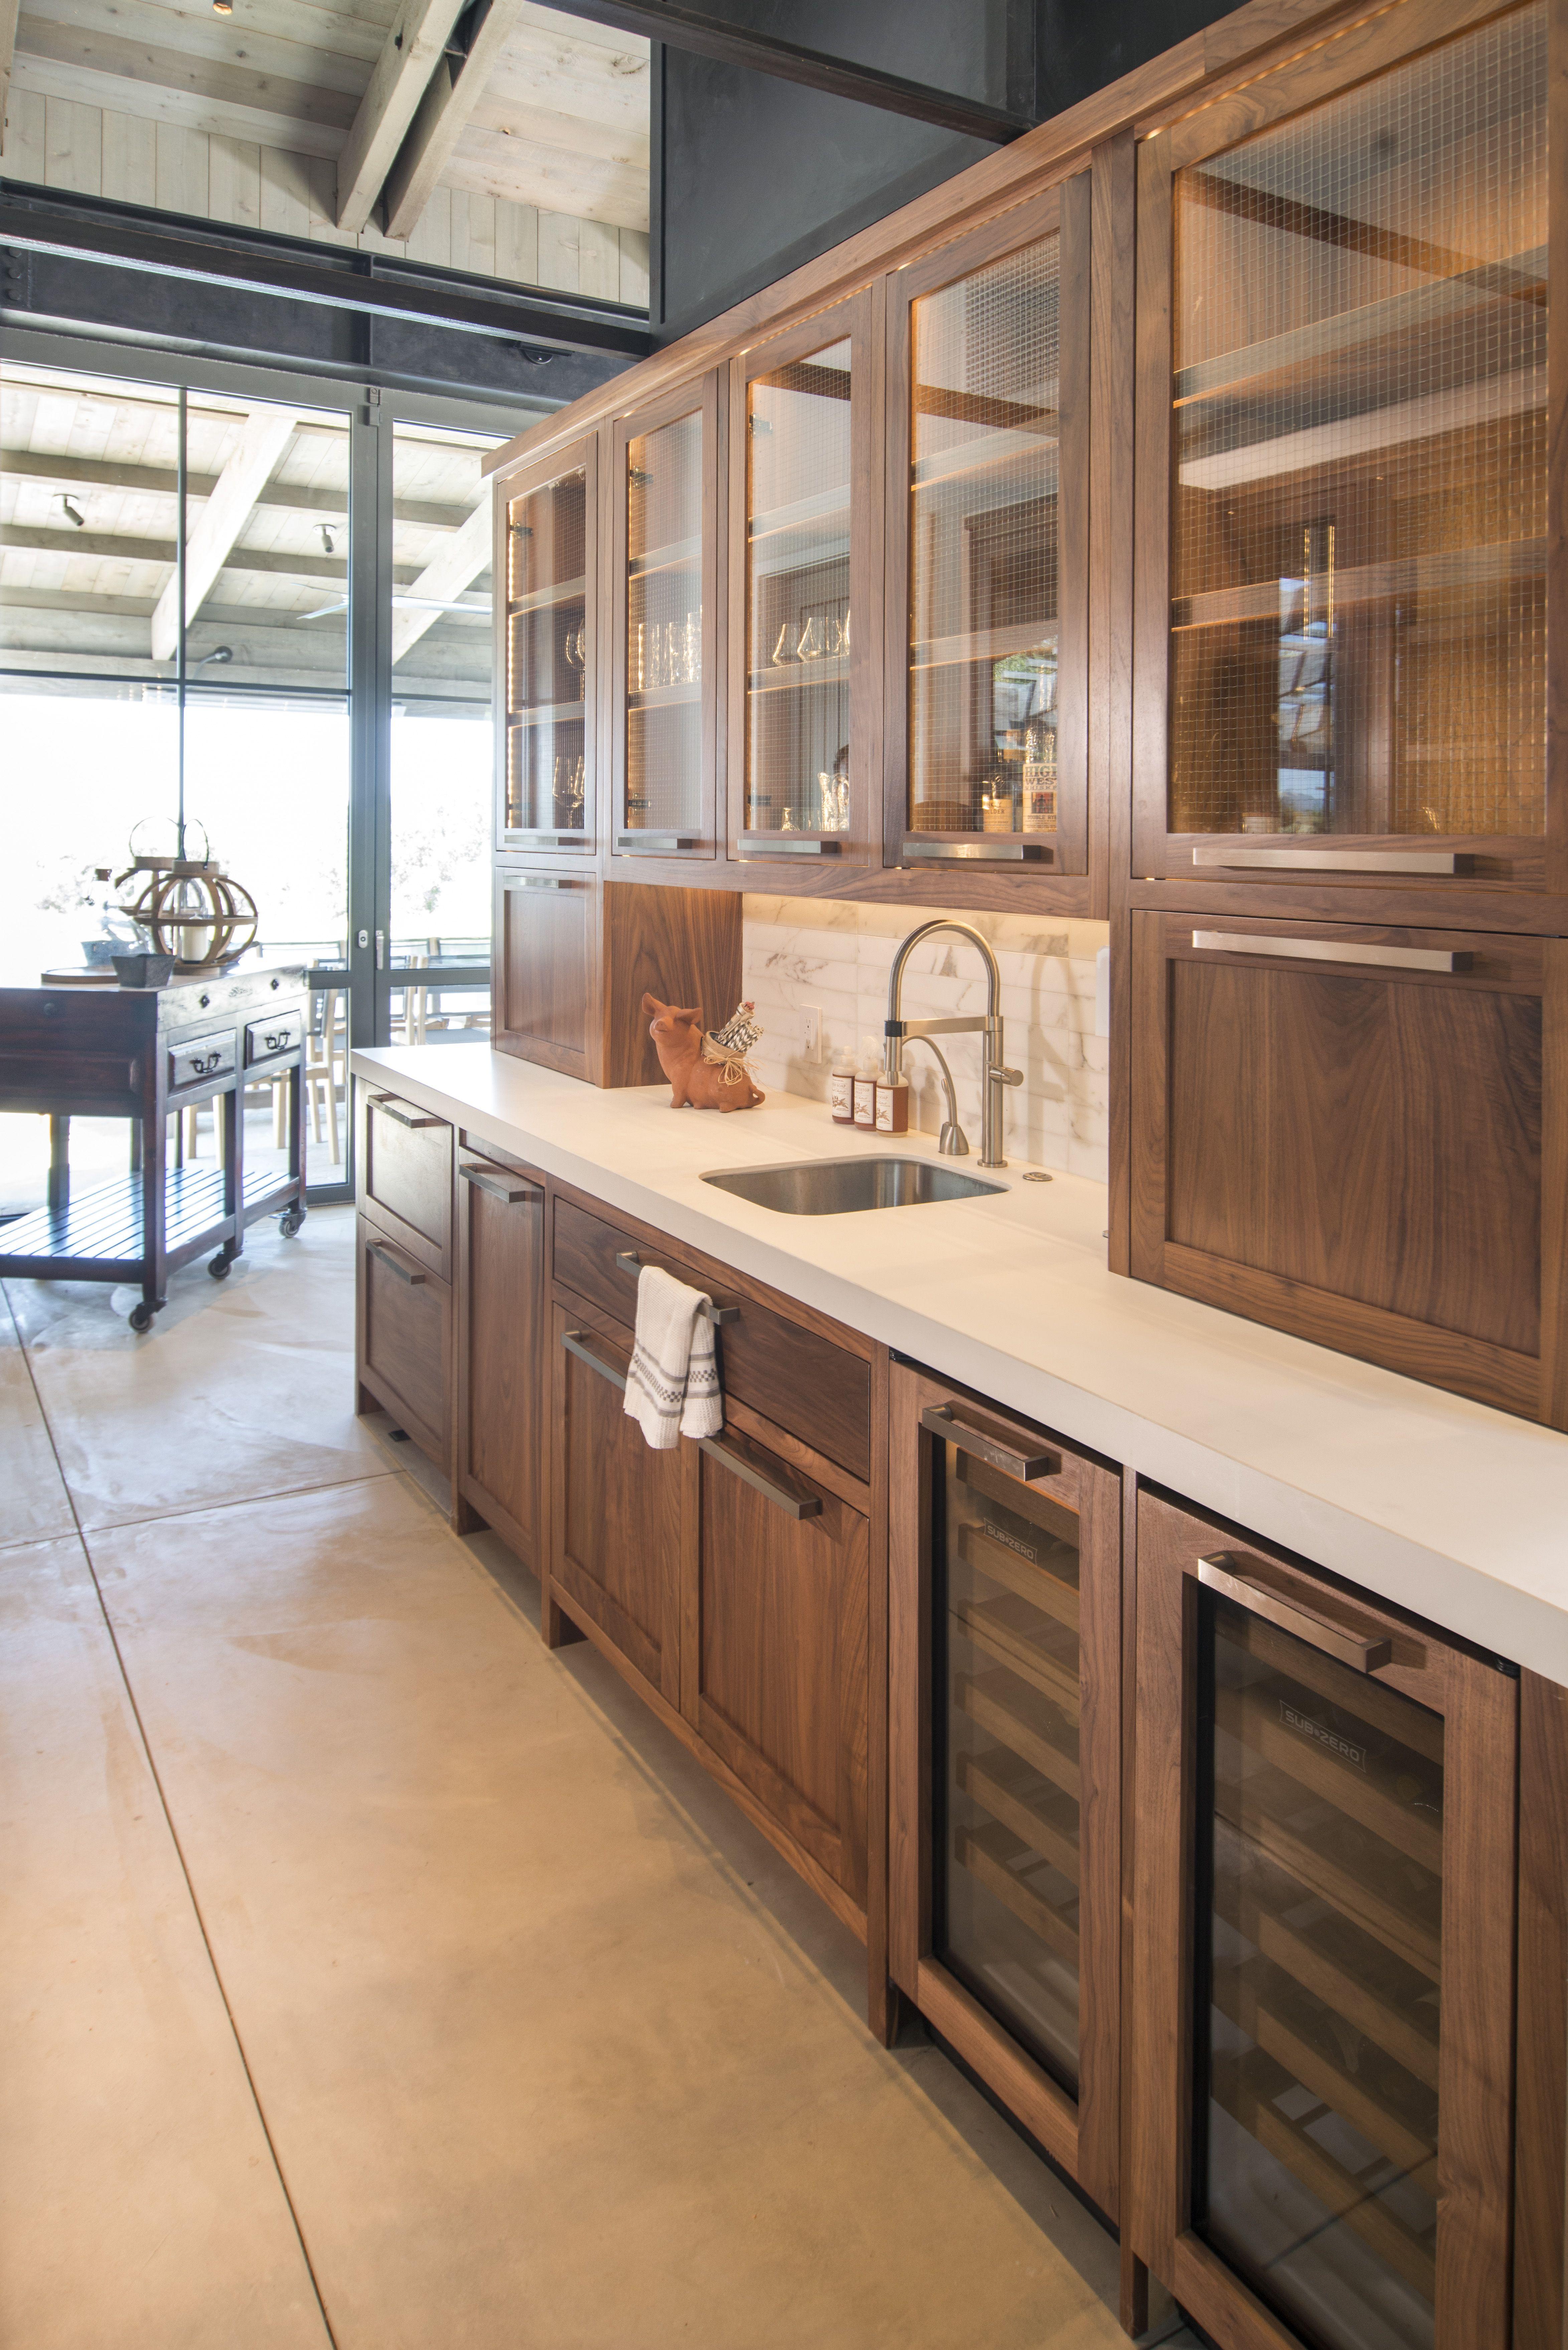 Precision Cabinets Brentwood Ca Transitional Kitchen Kitchen Cabinet Manufacturers Kitchen Design